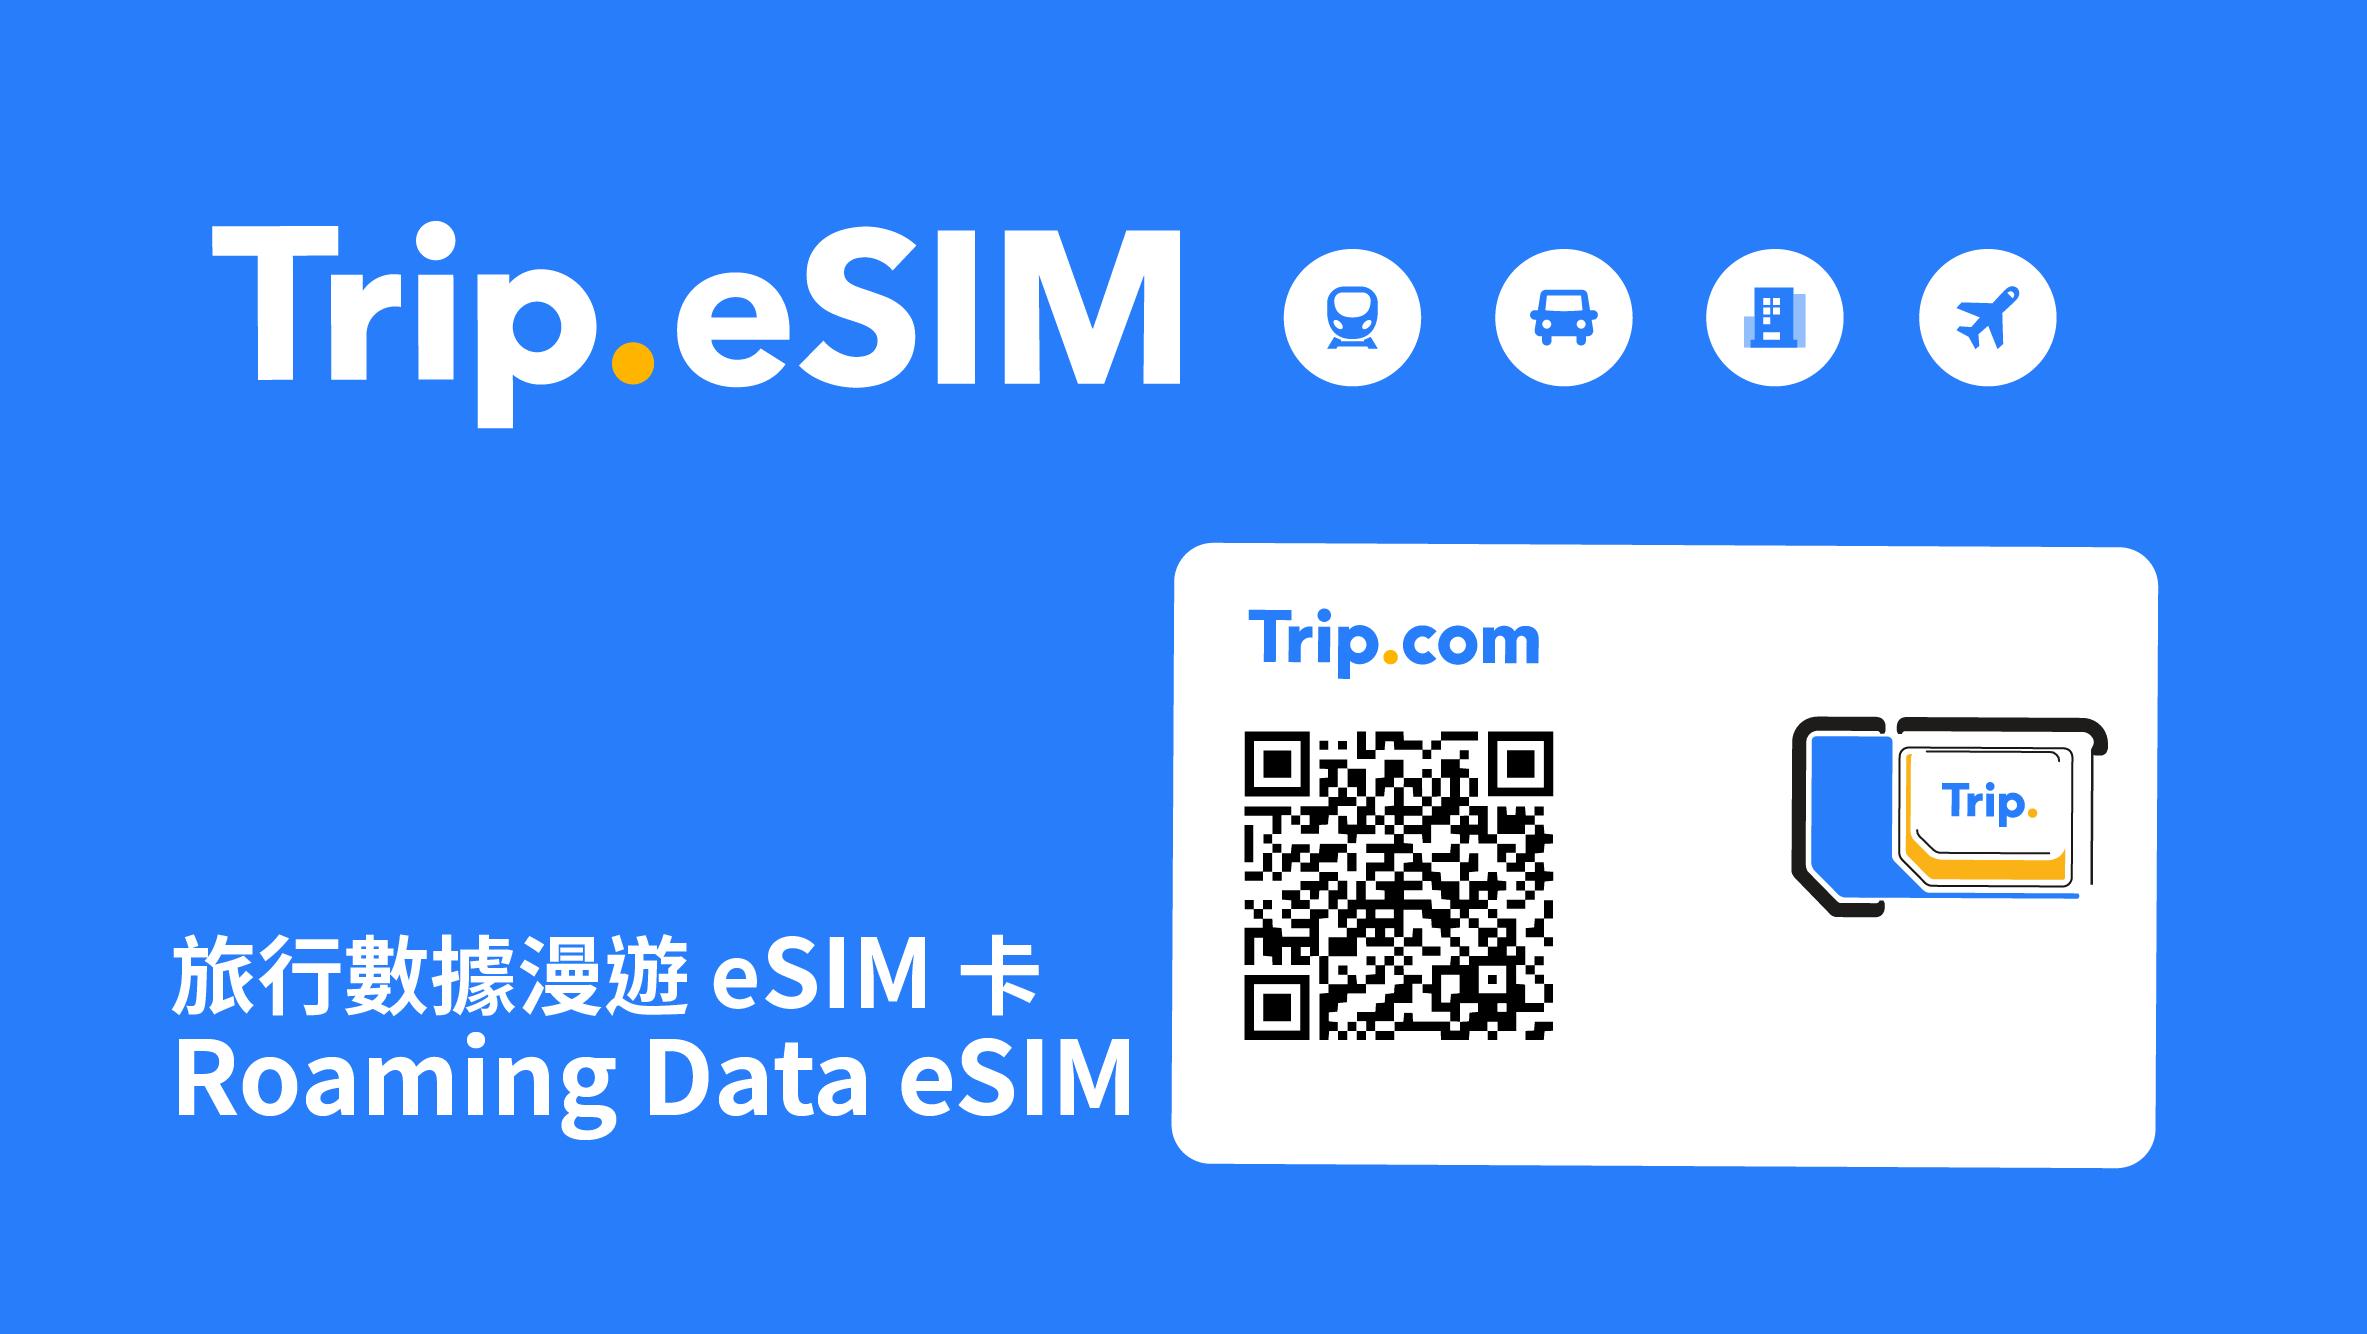 Trip.eSIM 旅遊數據漫遊 eSIM 卡 4日/7日(虛擬 SIM 卡)